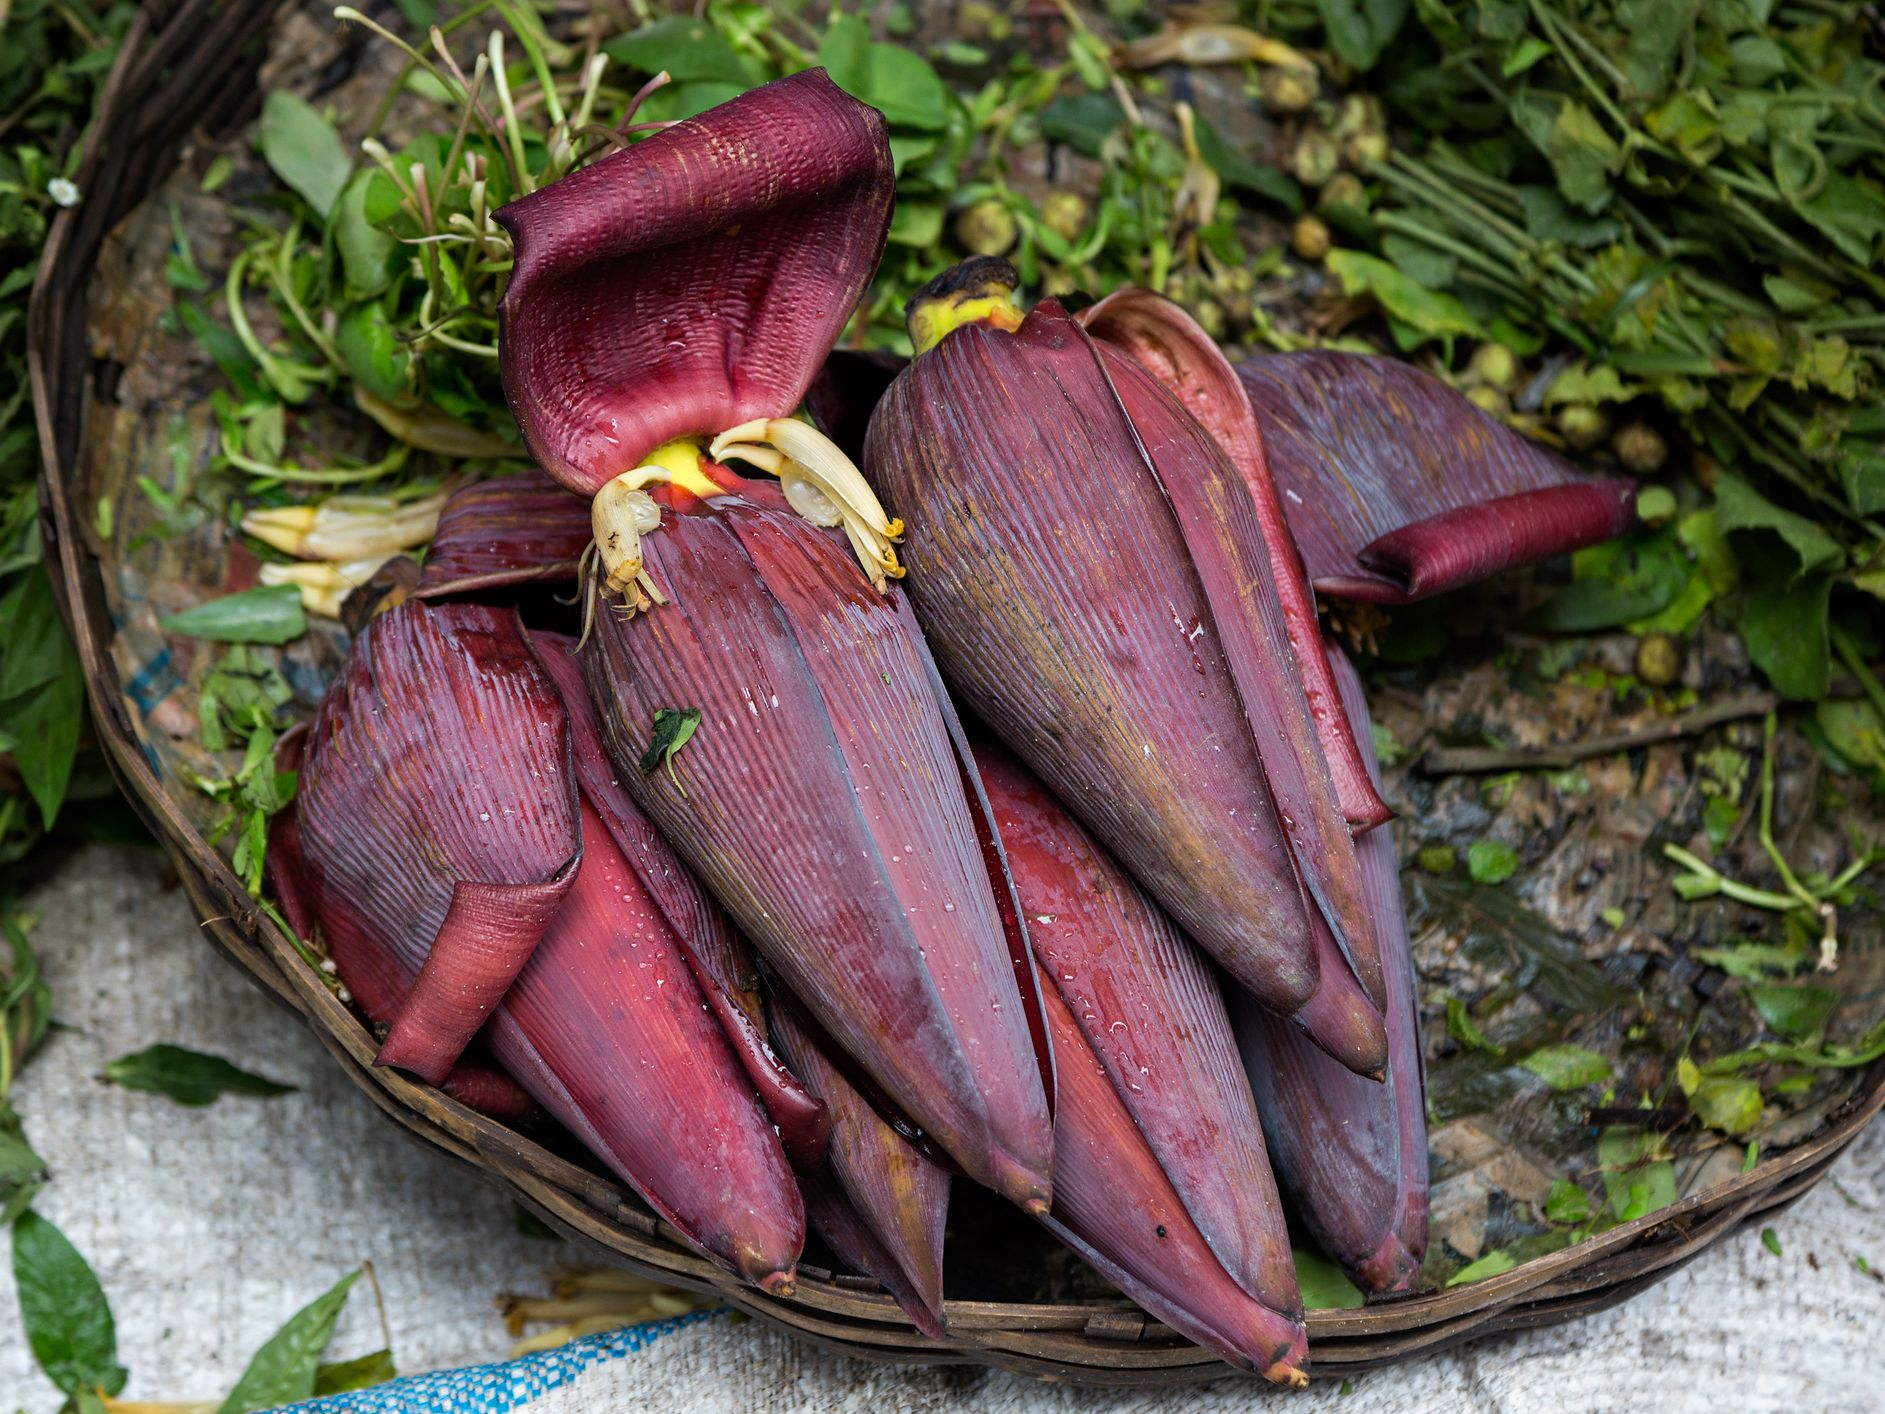 Banana Flower Is Edible